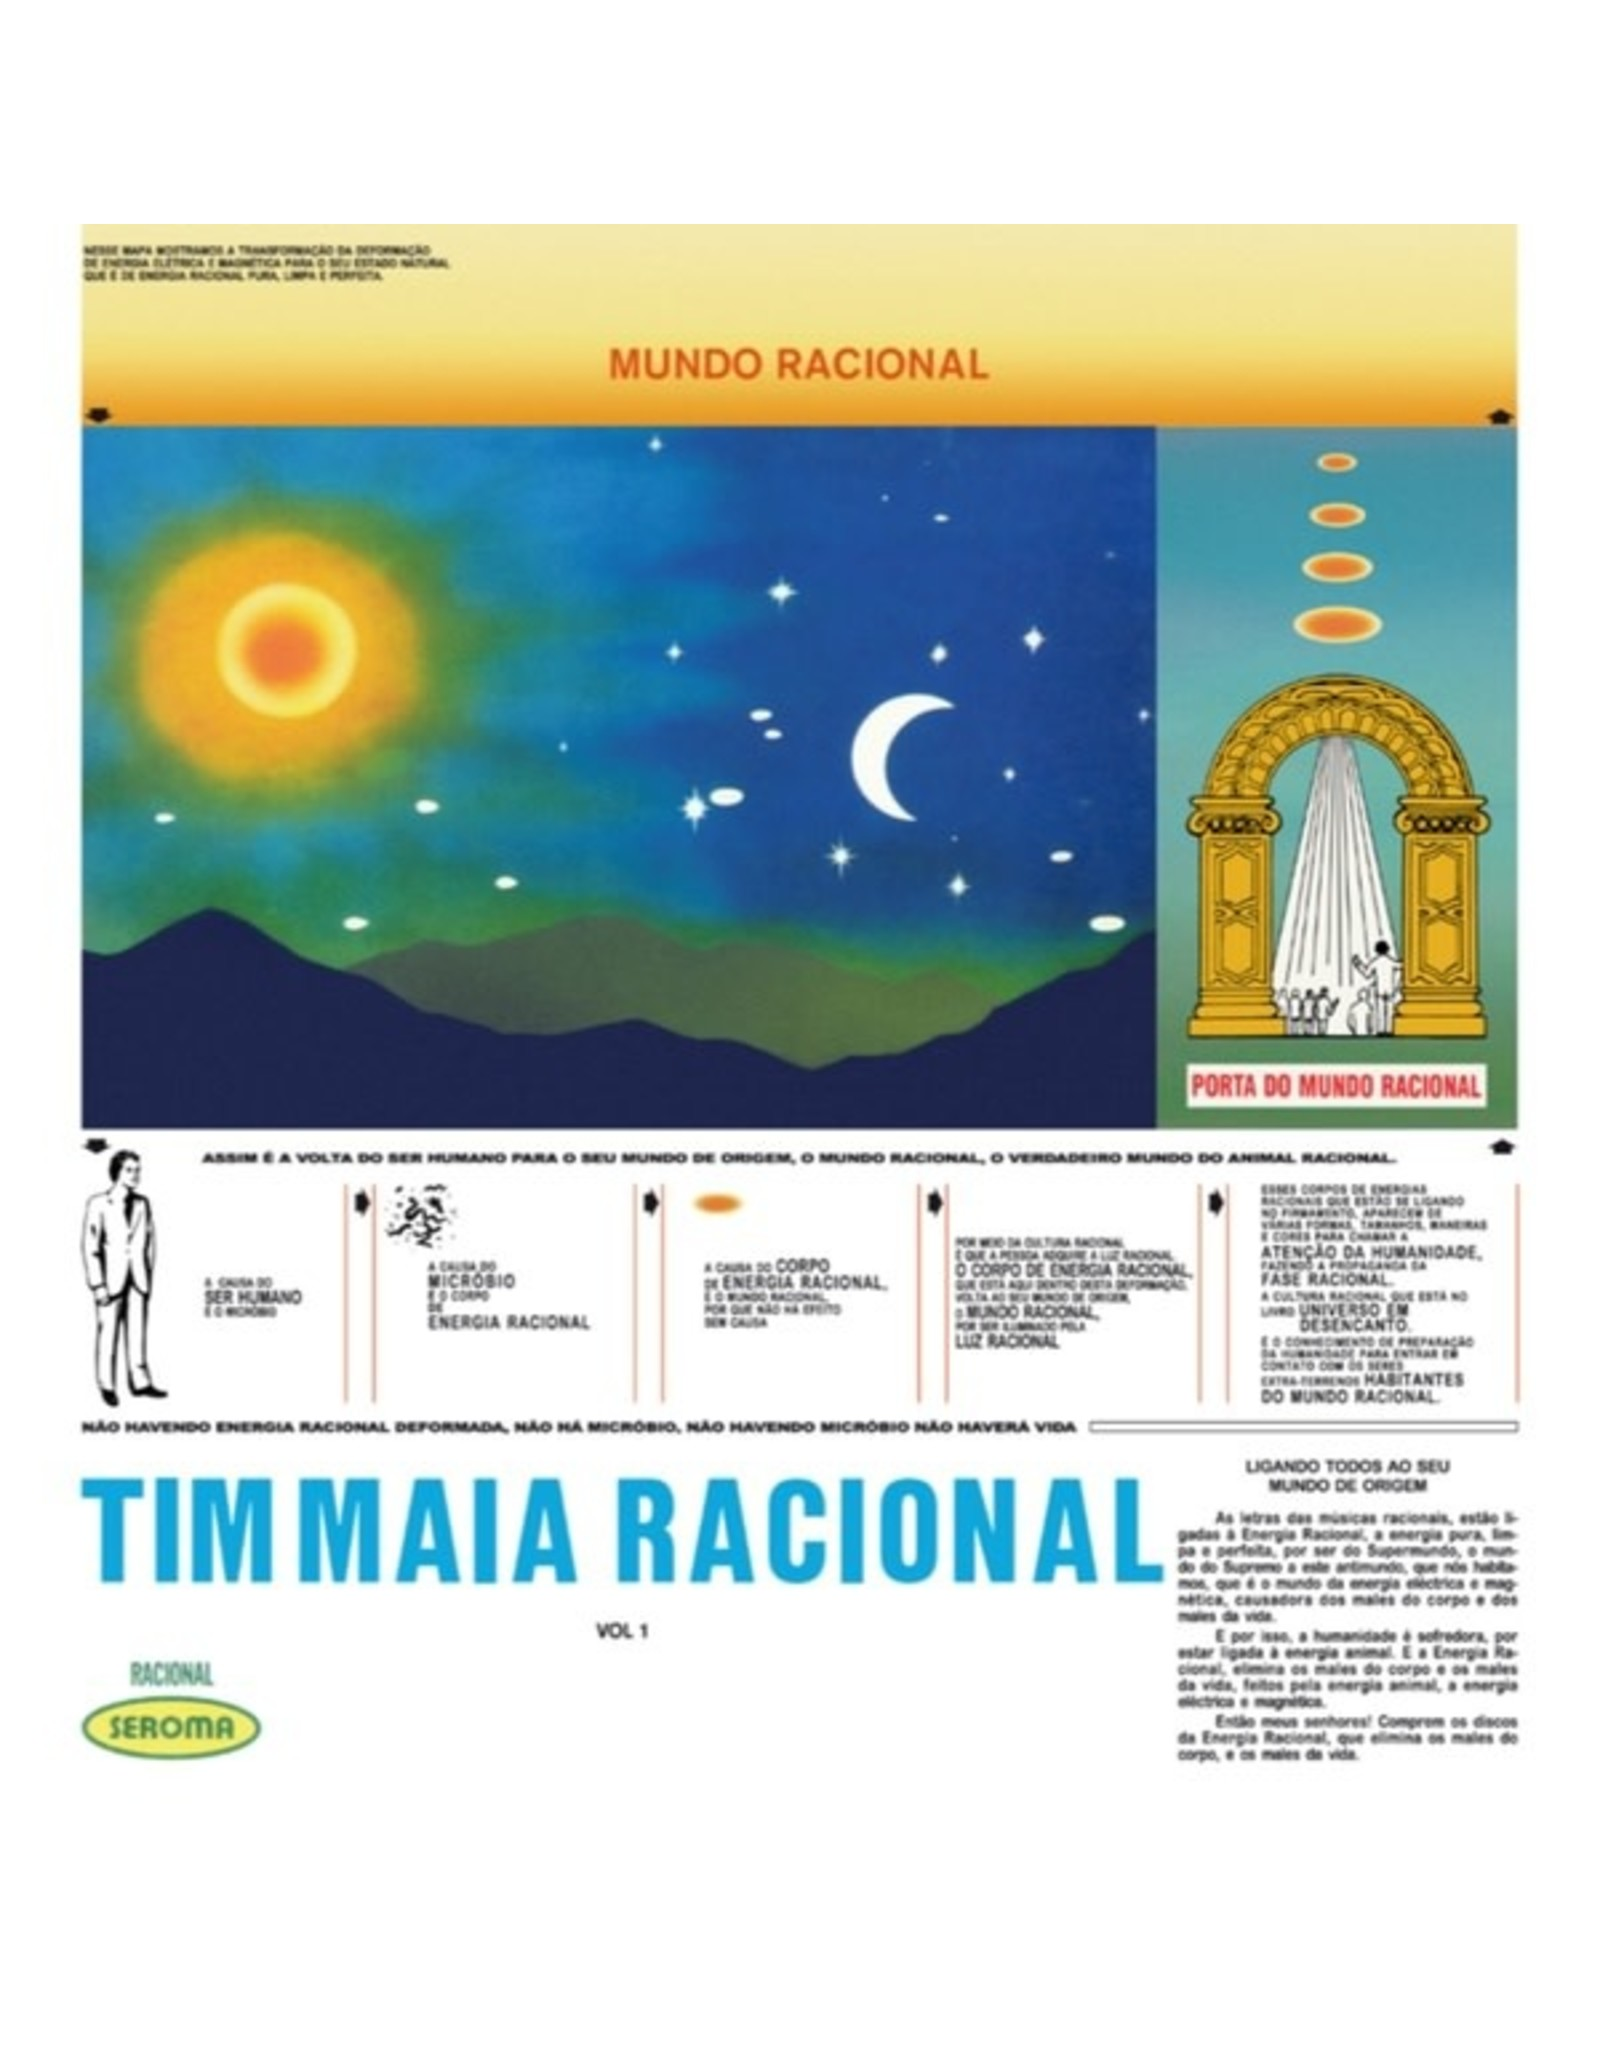 New Vinyl Tim Maia - Racional Vol. 1 LP